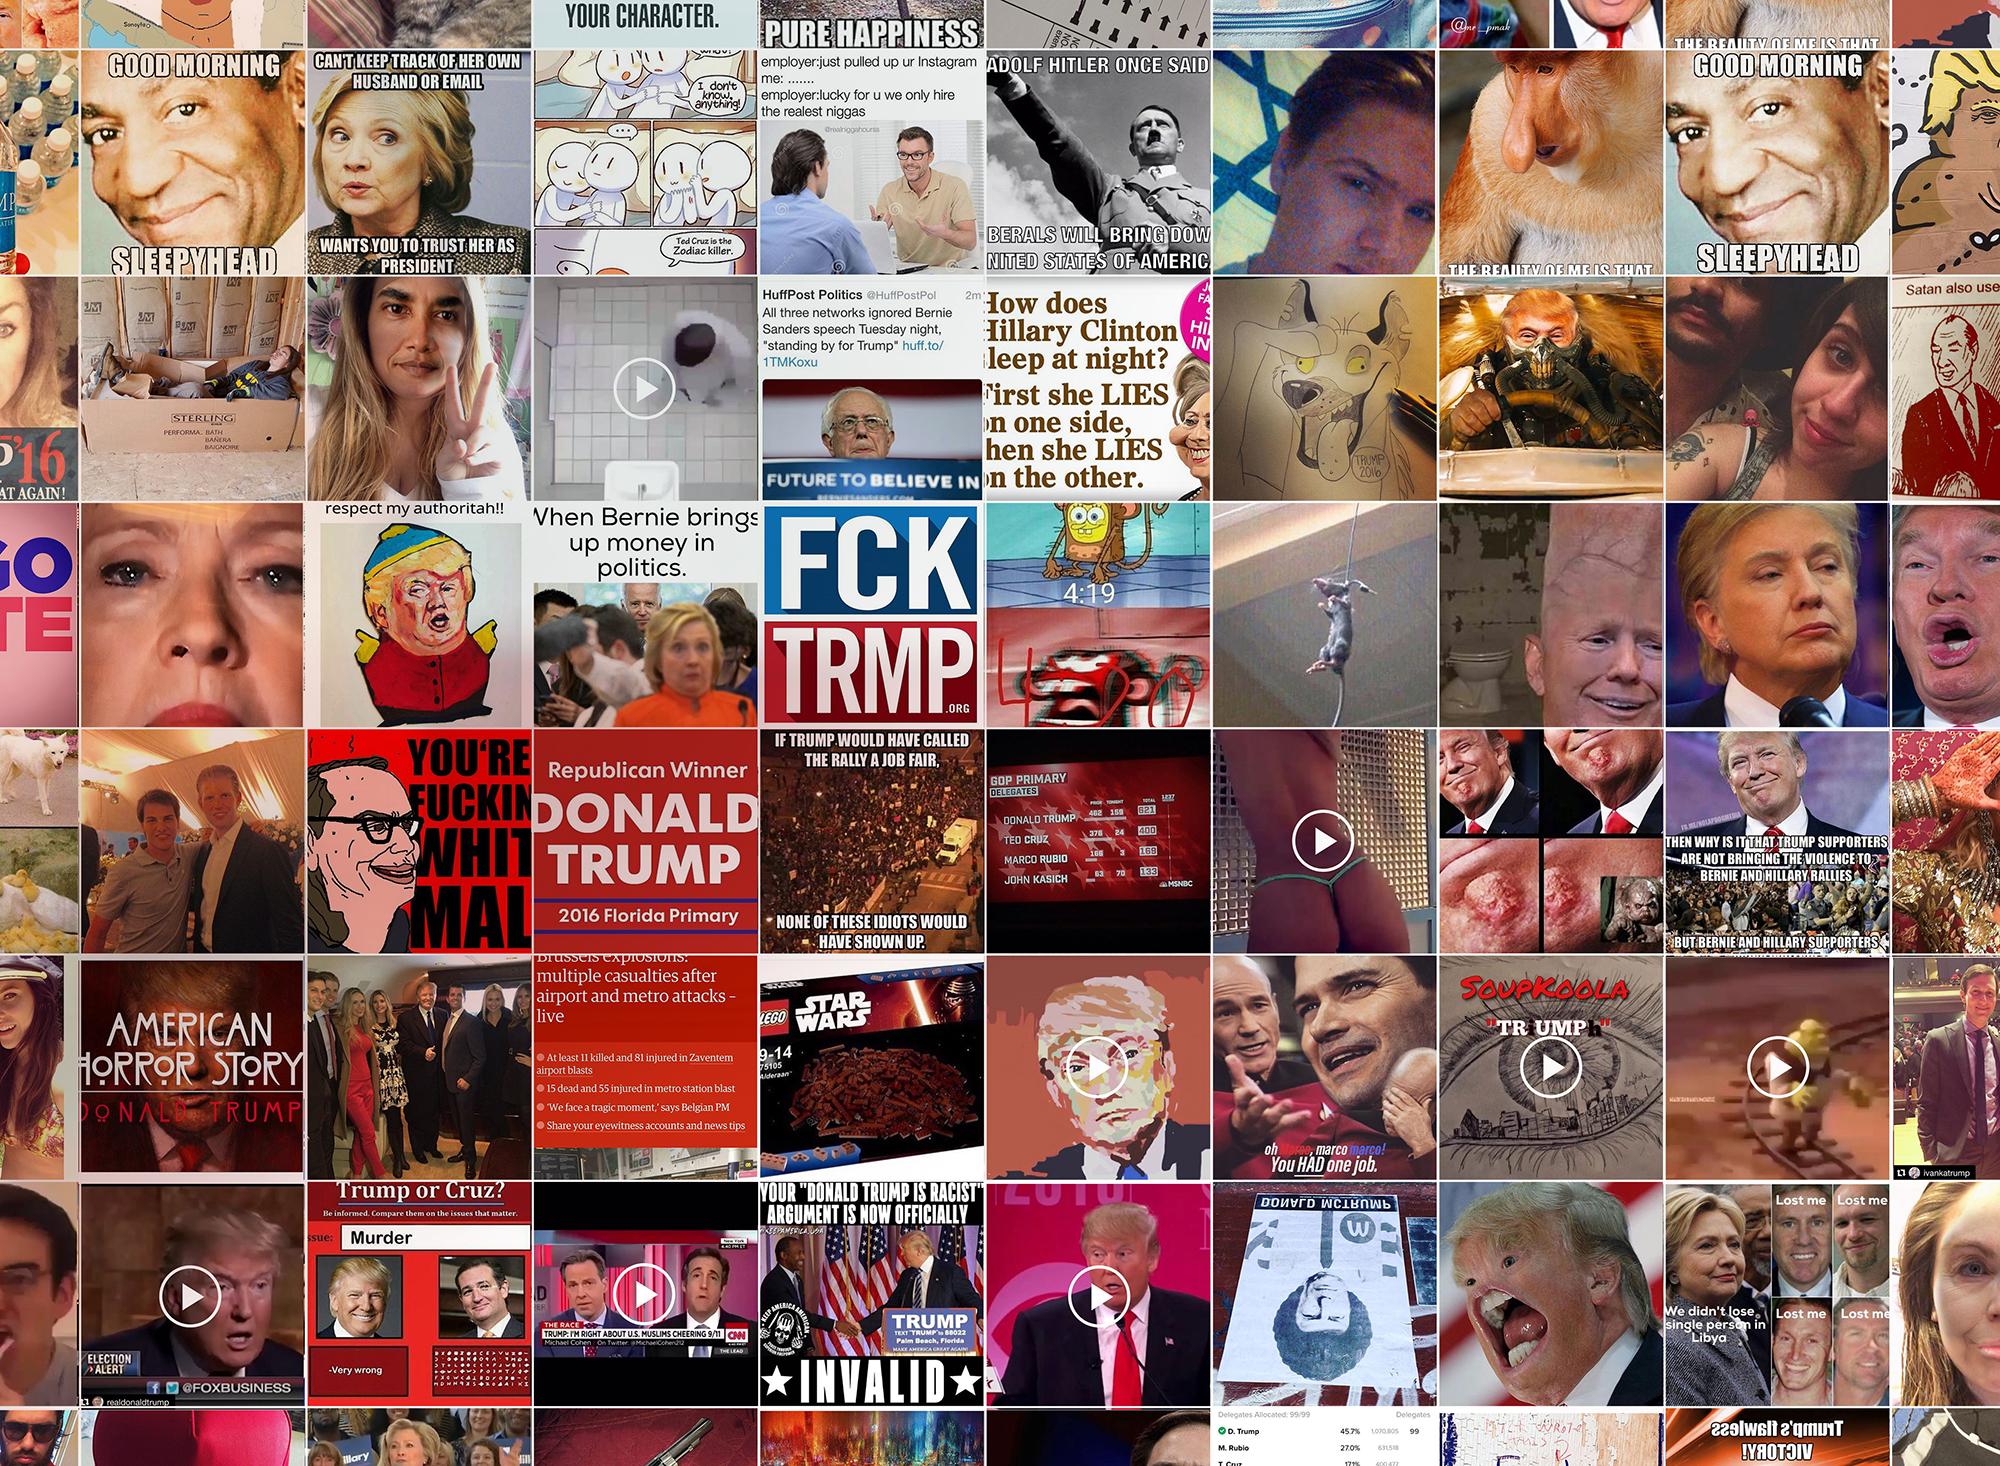 Trump-SqSp-detail.jpg